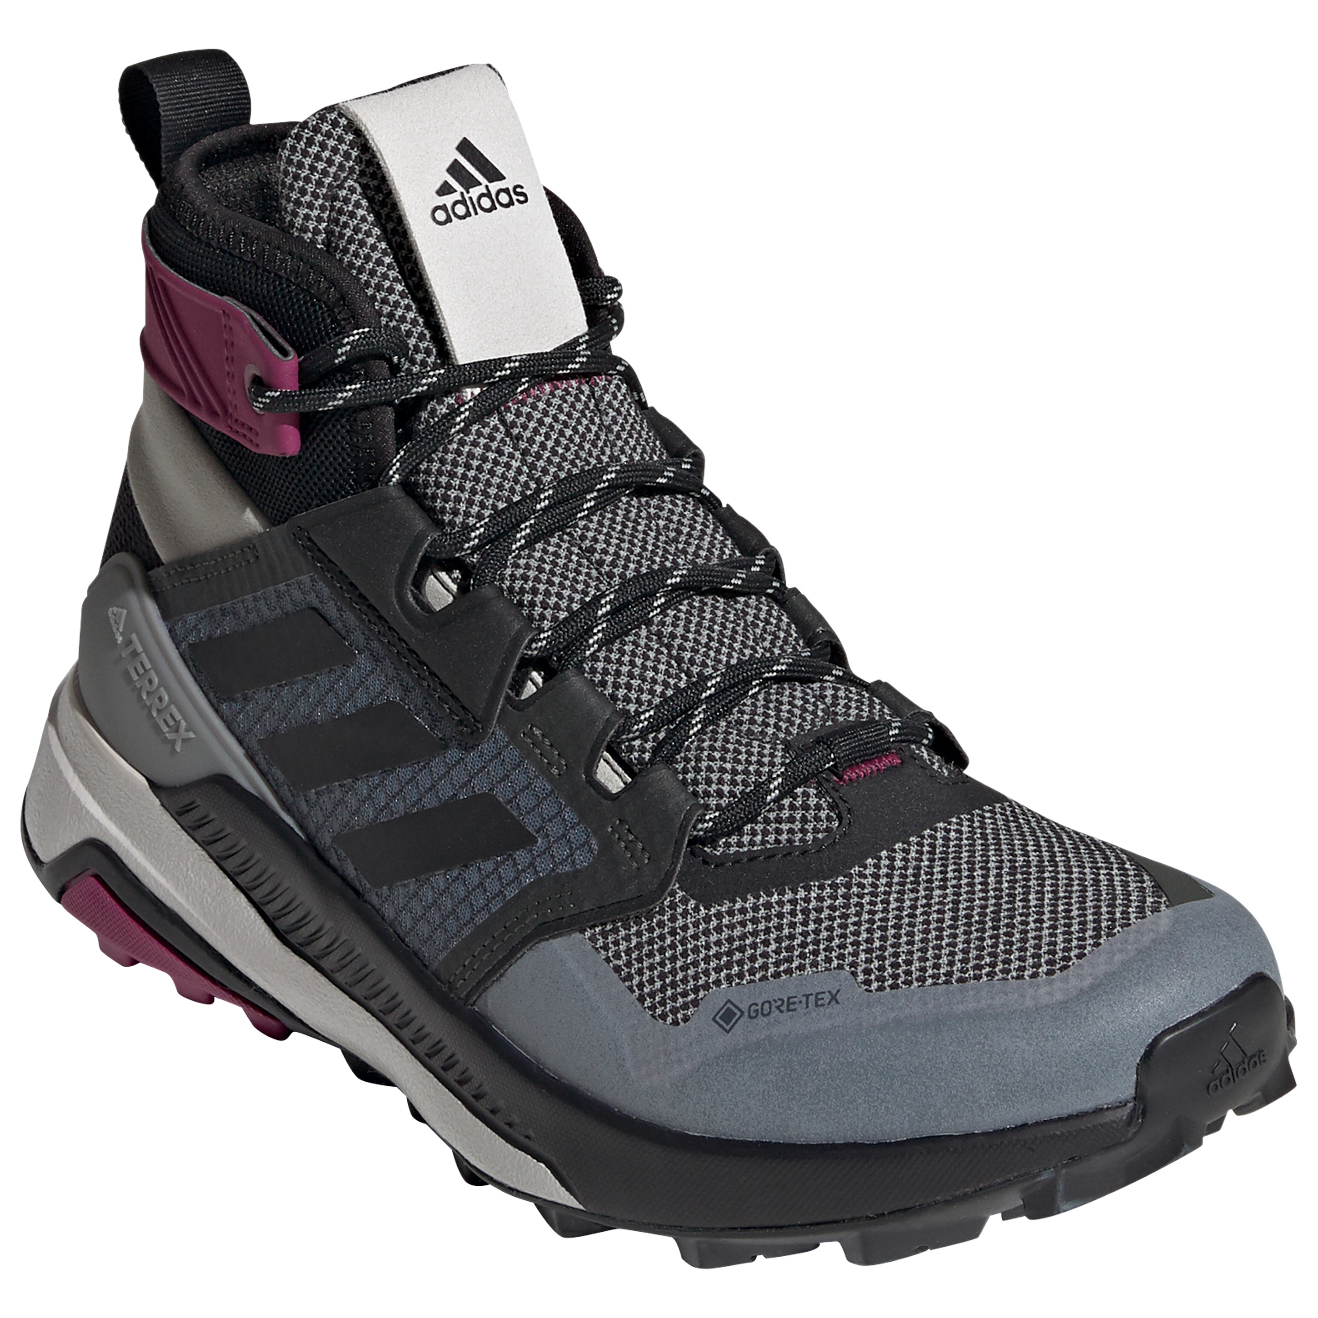 Adidas Terrex Trailmaker Mid GTX